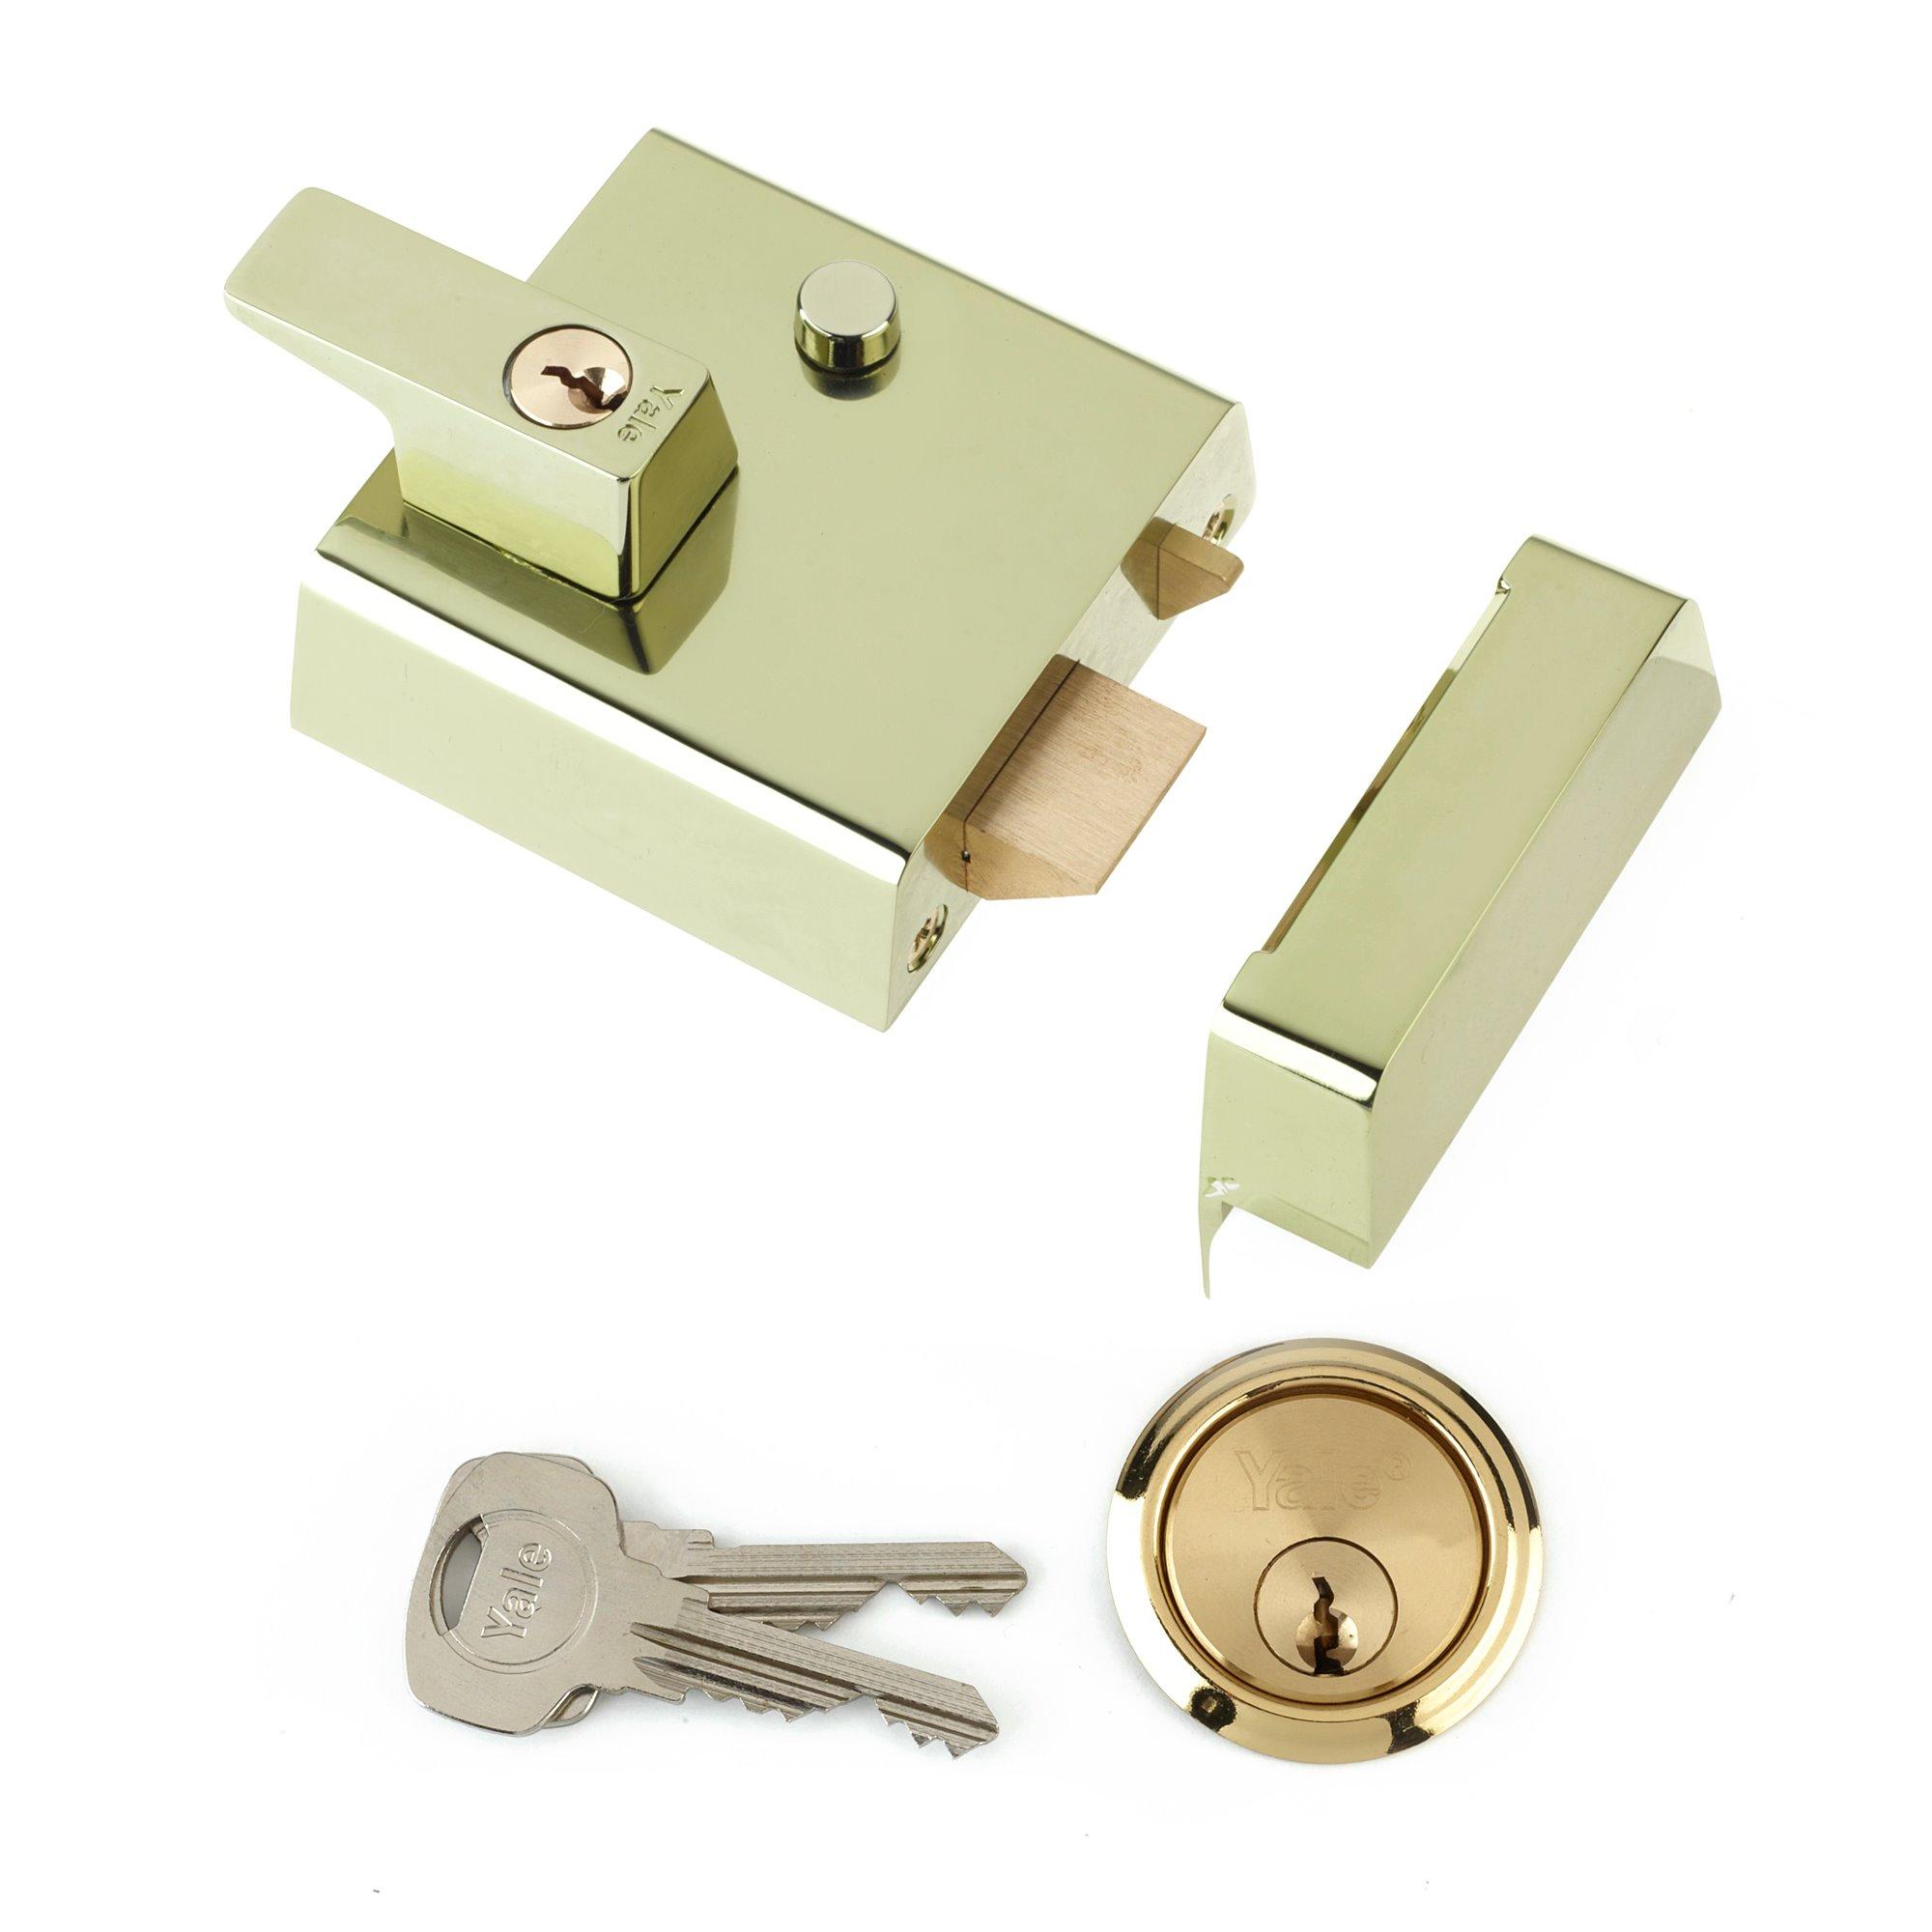 P1 / P2 Double Locking Nightlatch